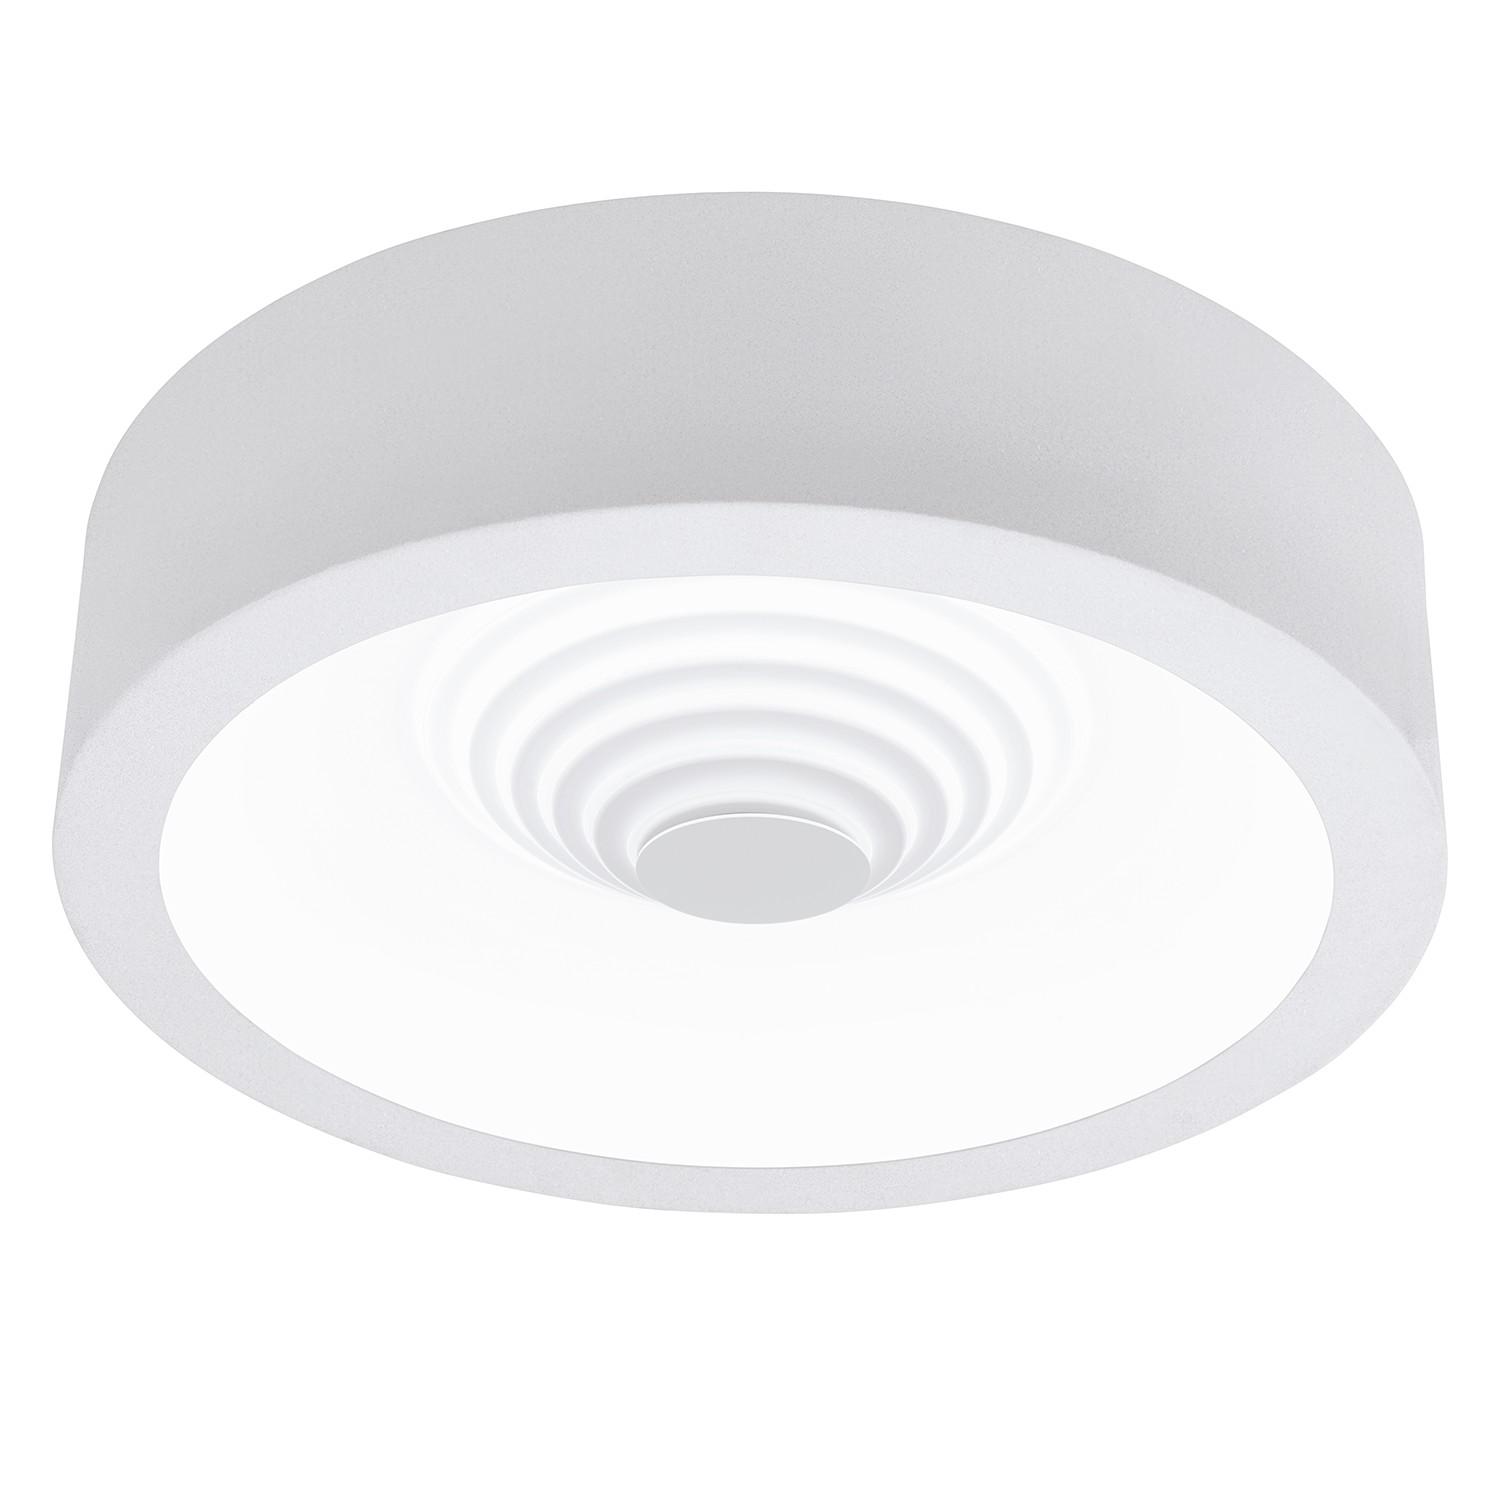 home24 LED-Deckenleuchte Leganes